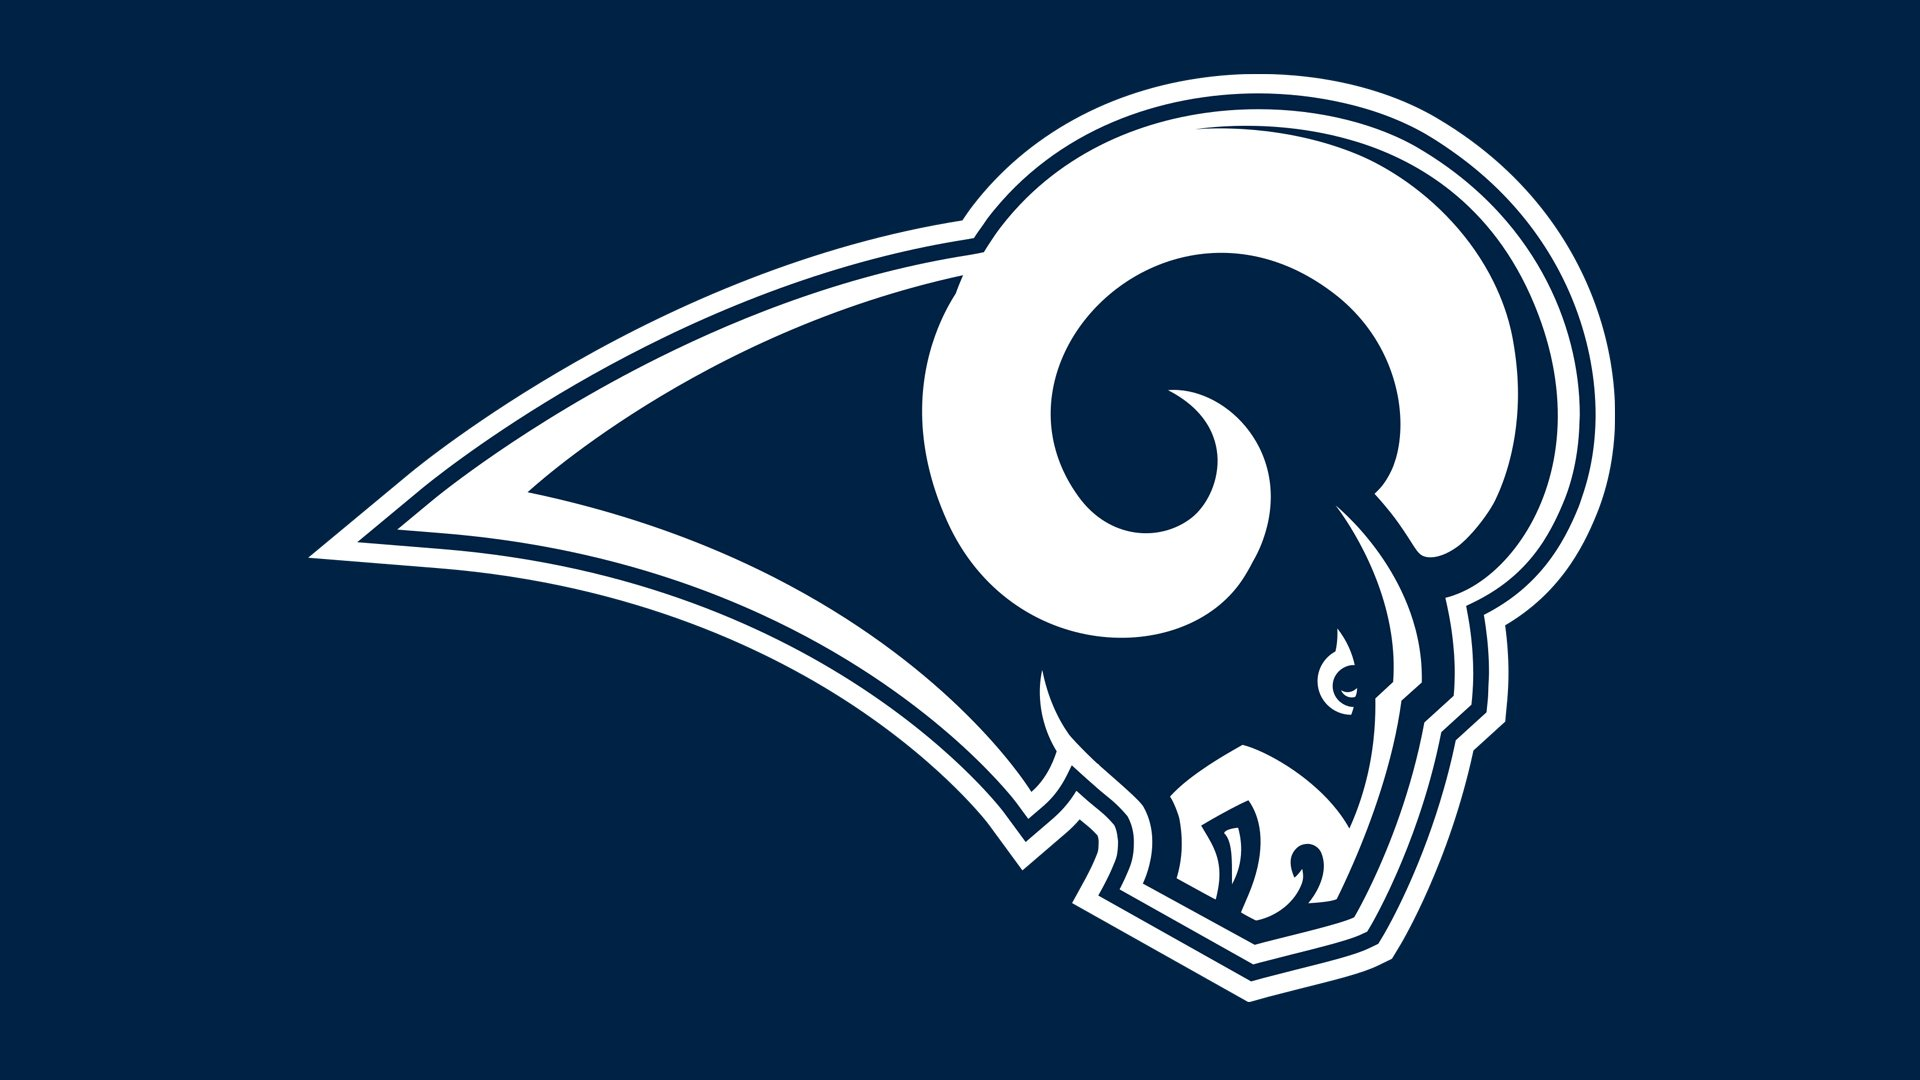 Los Angeles Rams Logo Los Angeles Rams Symbol Meaning